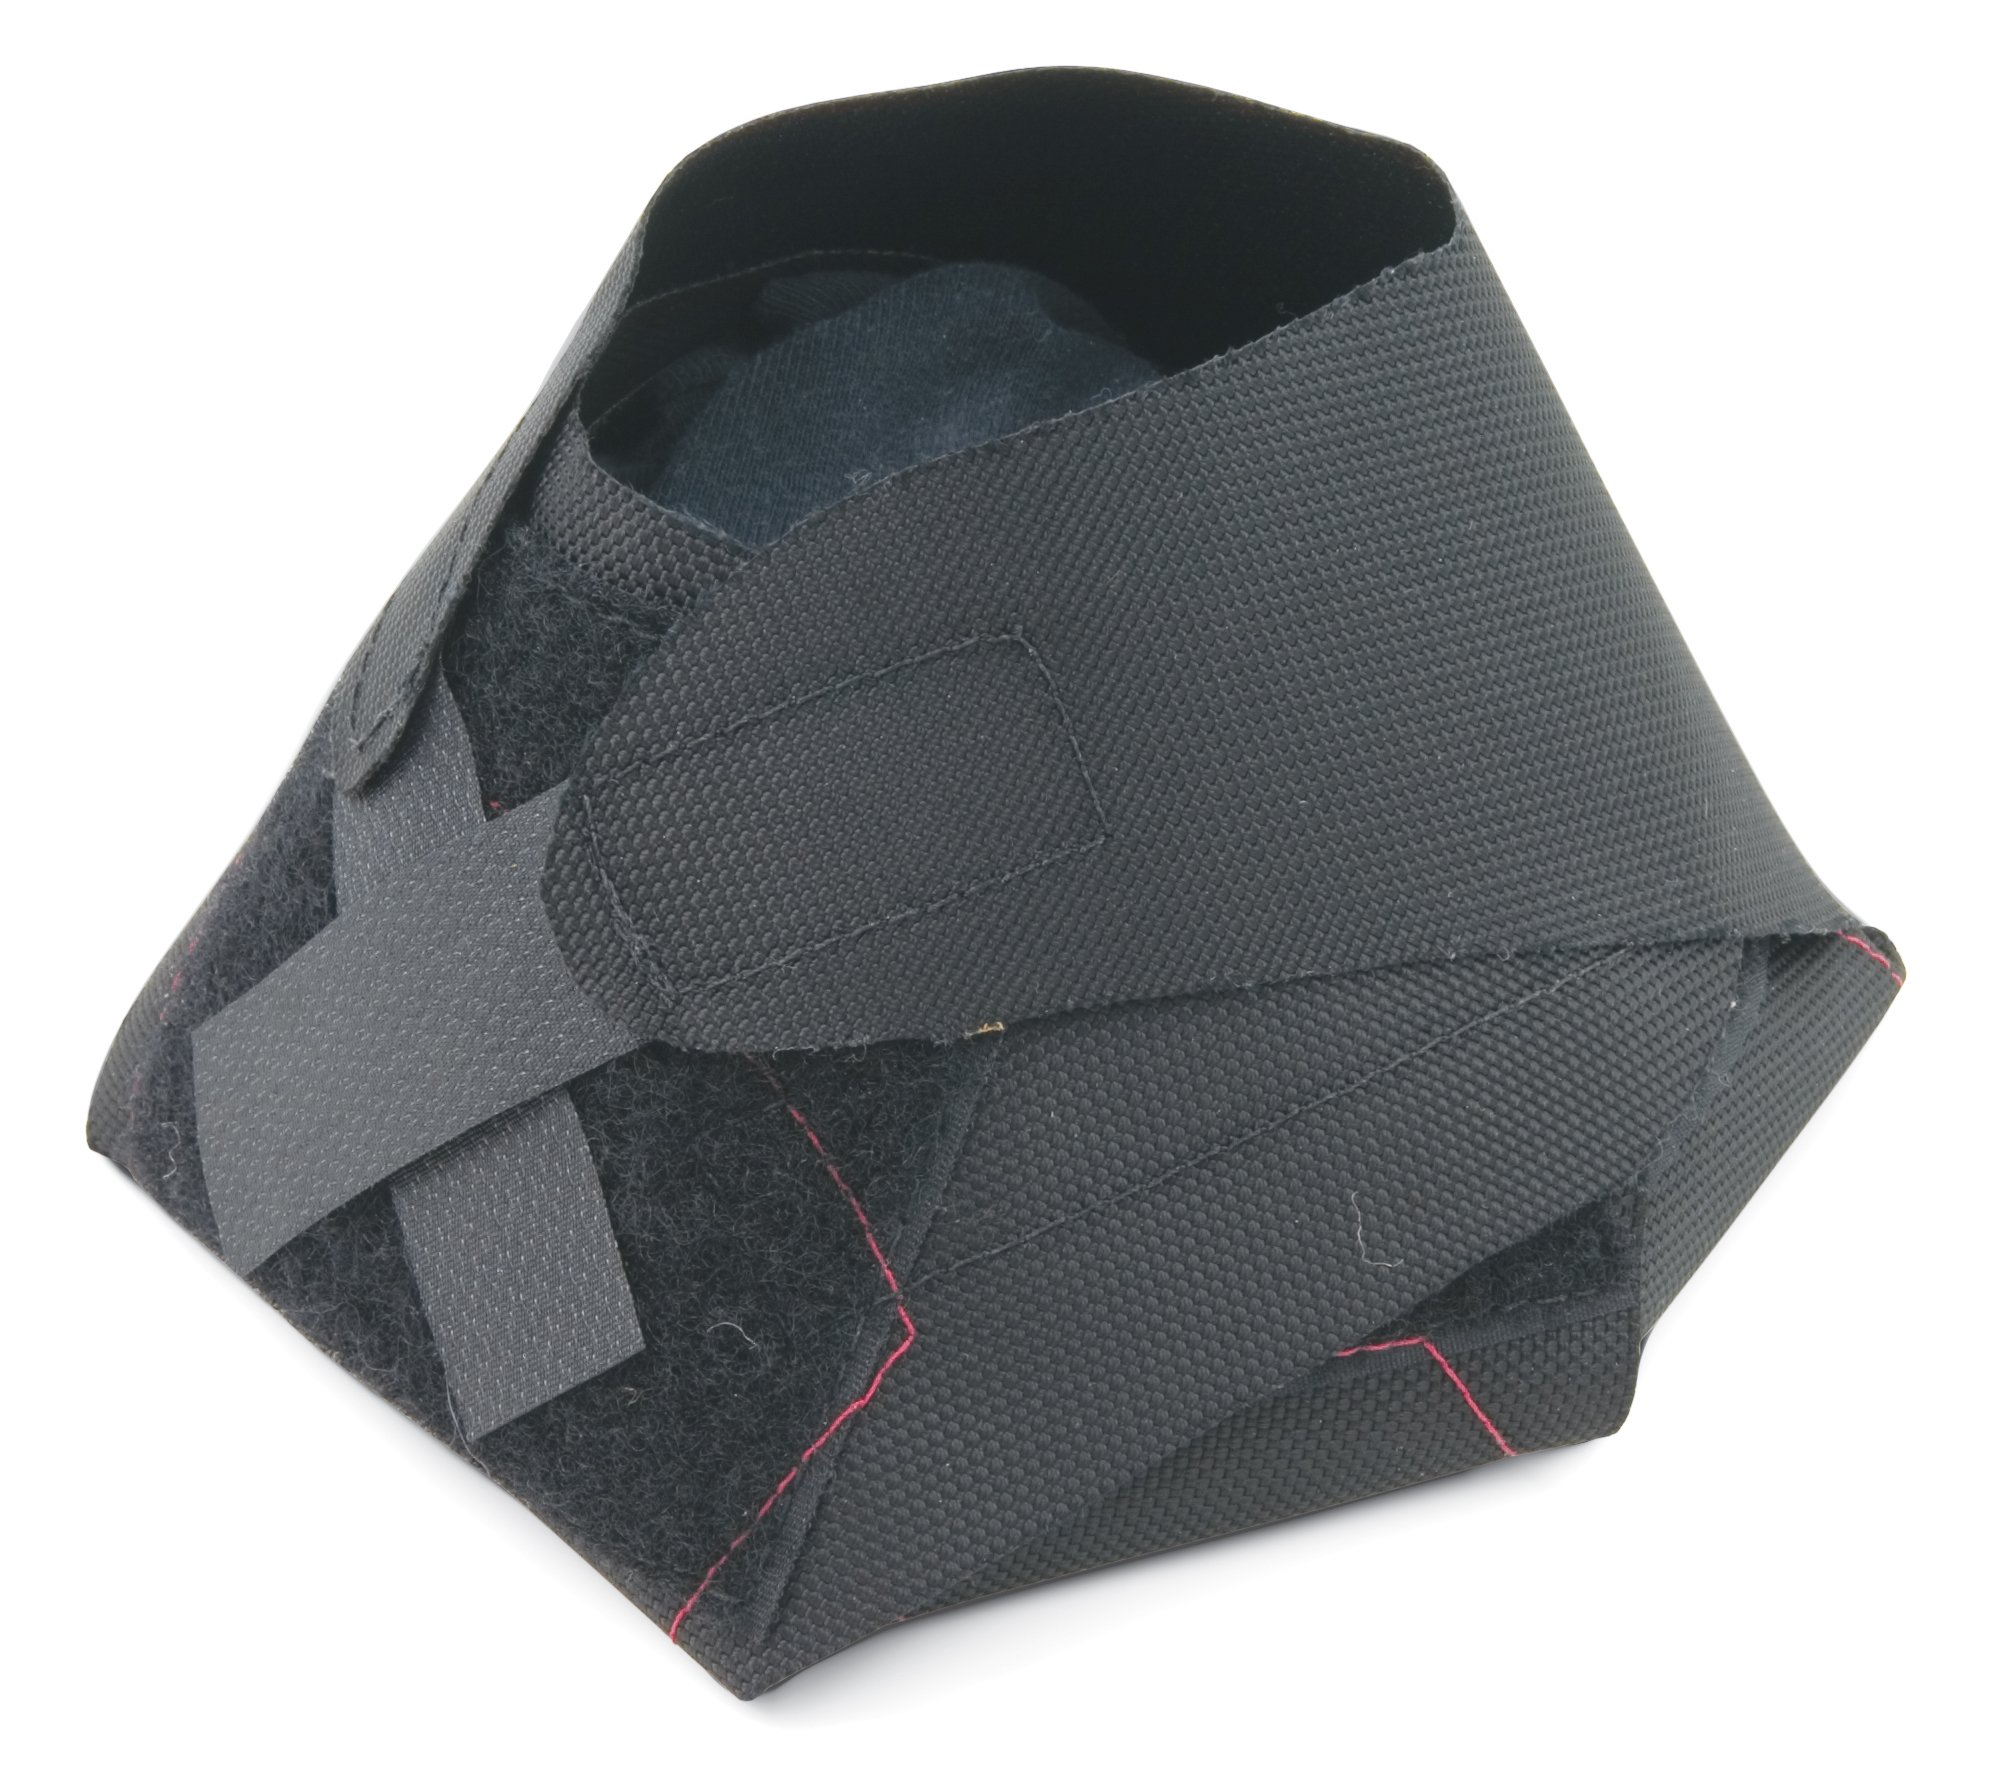 Hoof Wraps Brand Bandage by Hoof Wraps